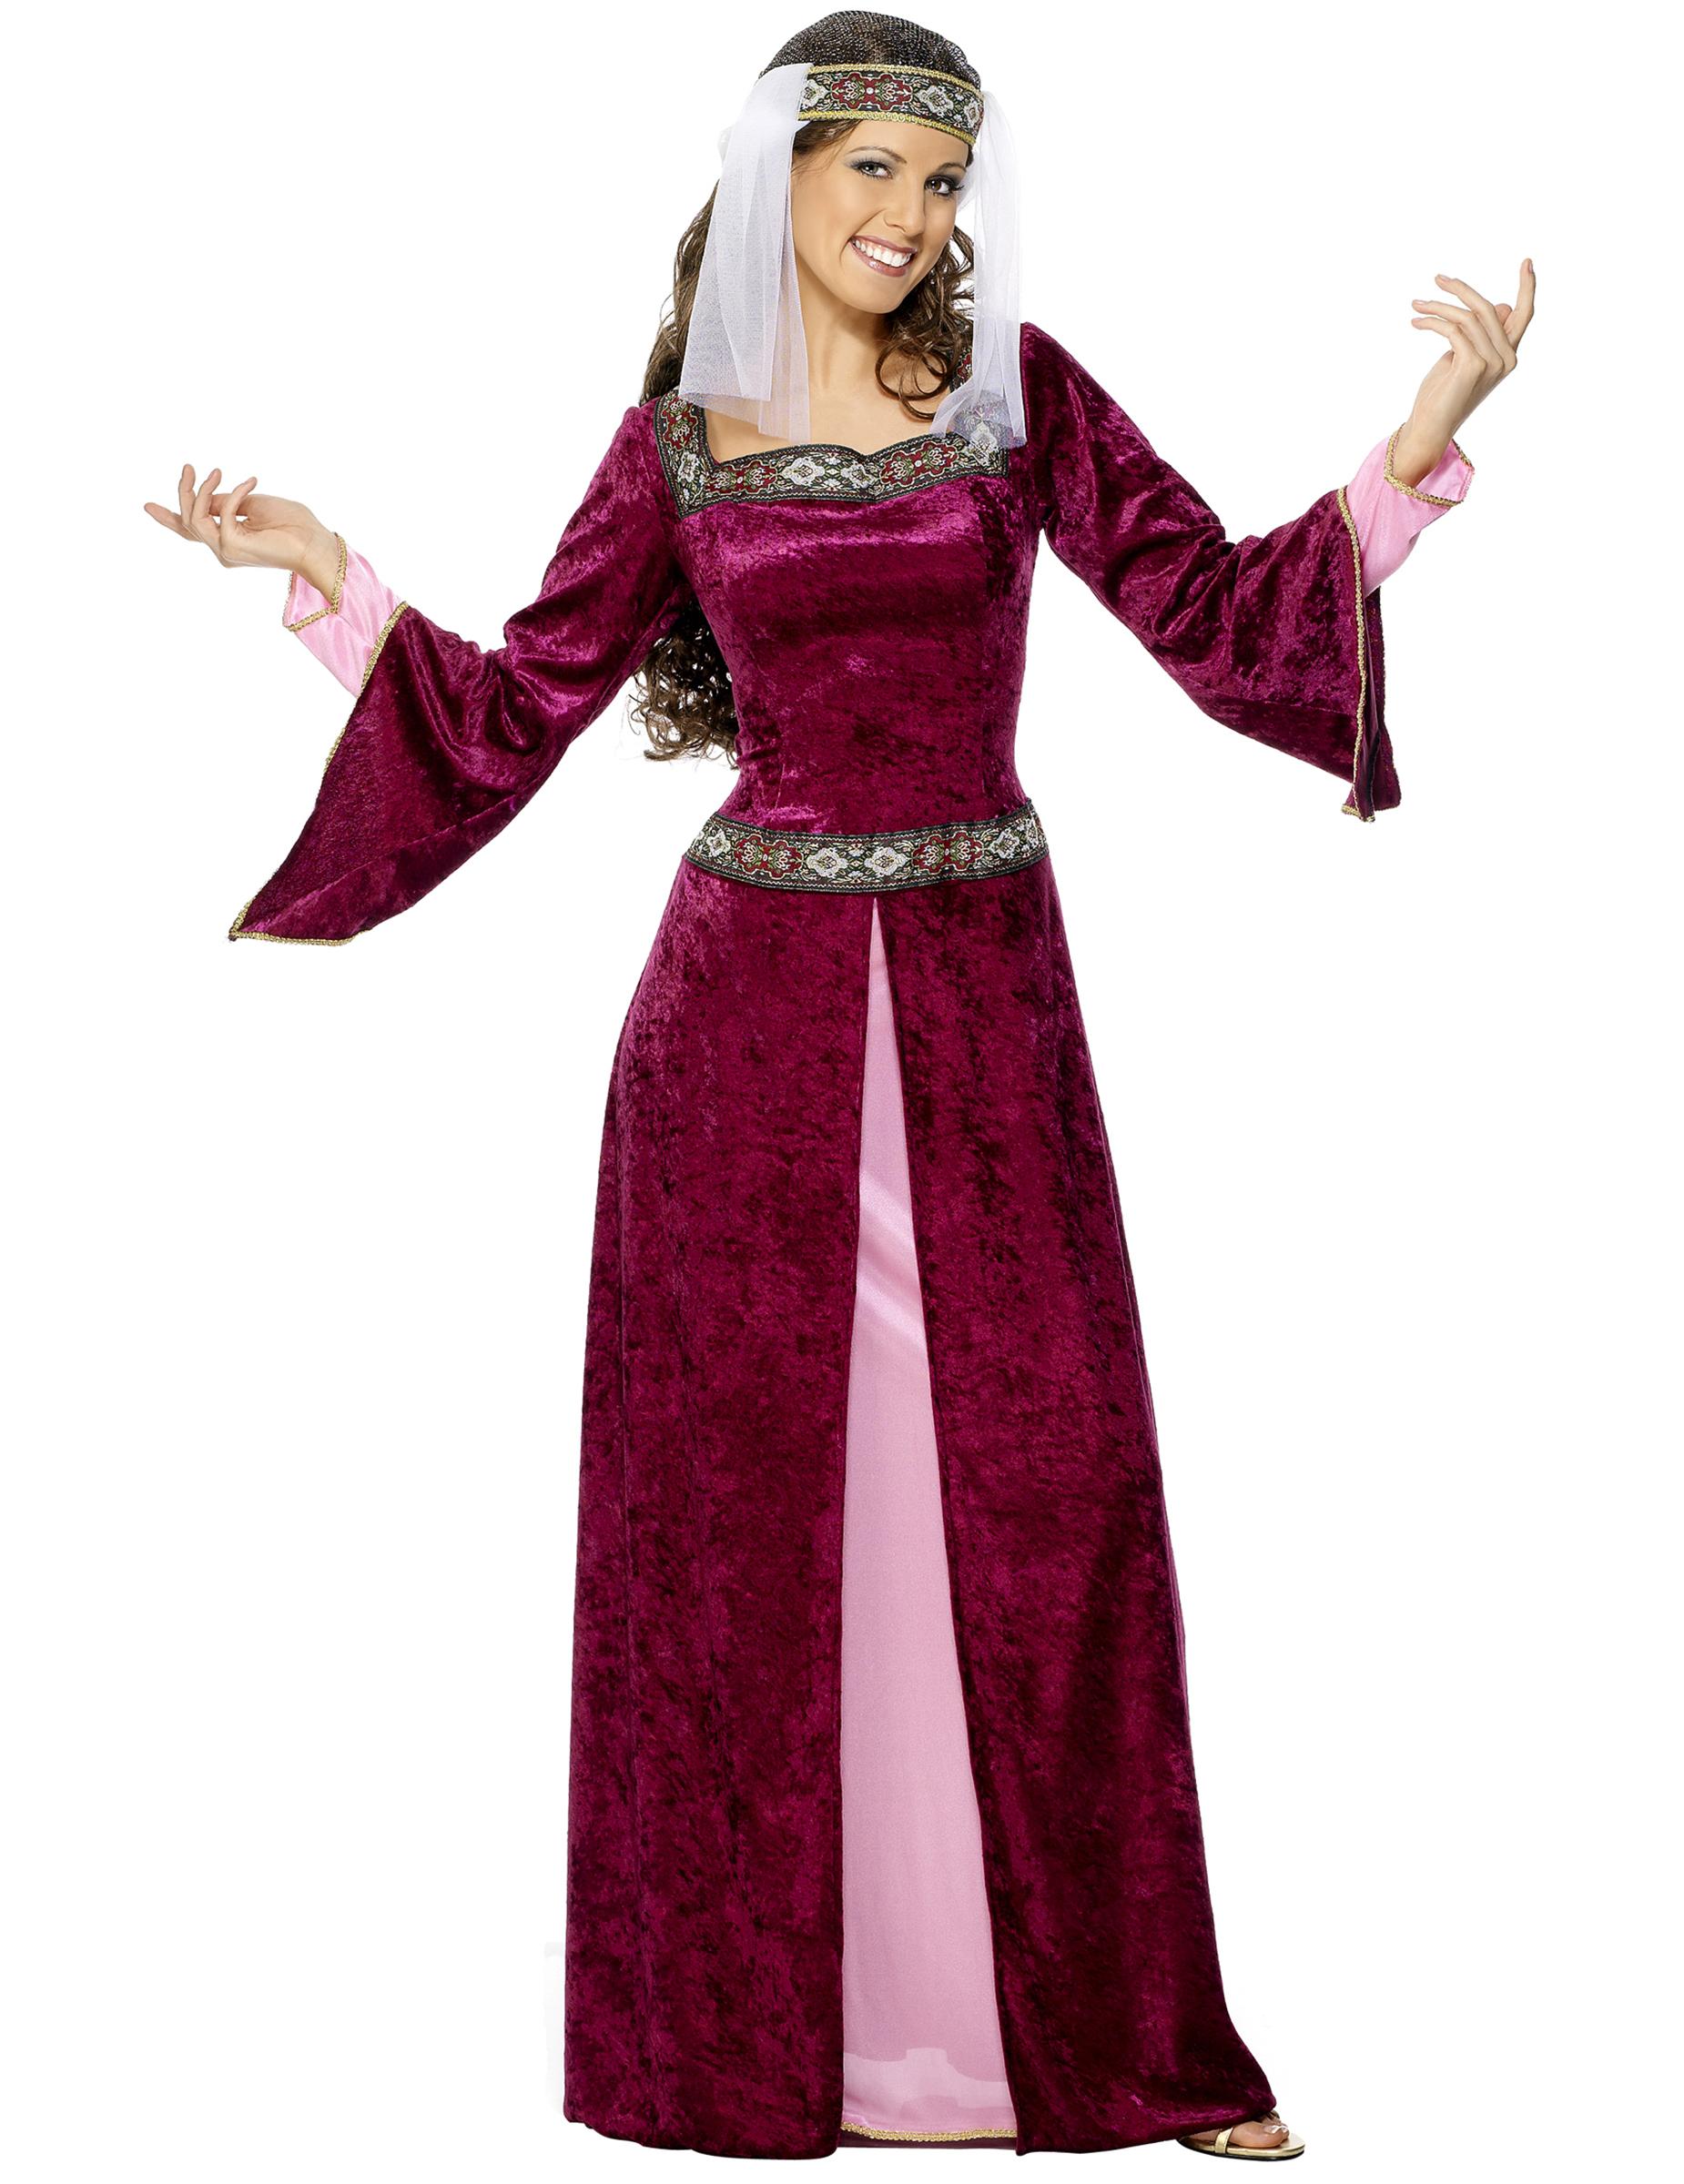 bb7b69ac3 Disfraz de reina medieval para mujer  Disfraces adultos